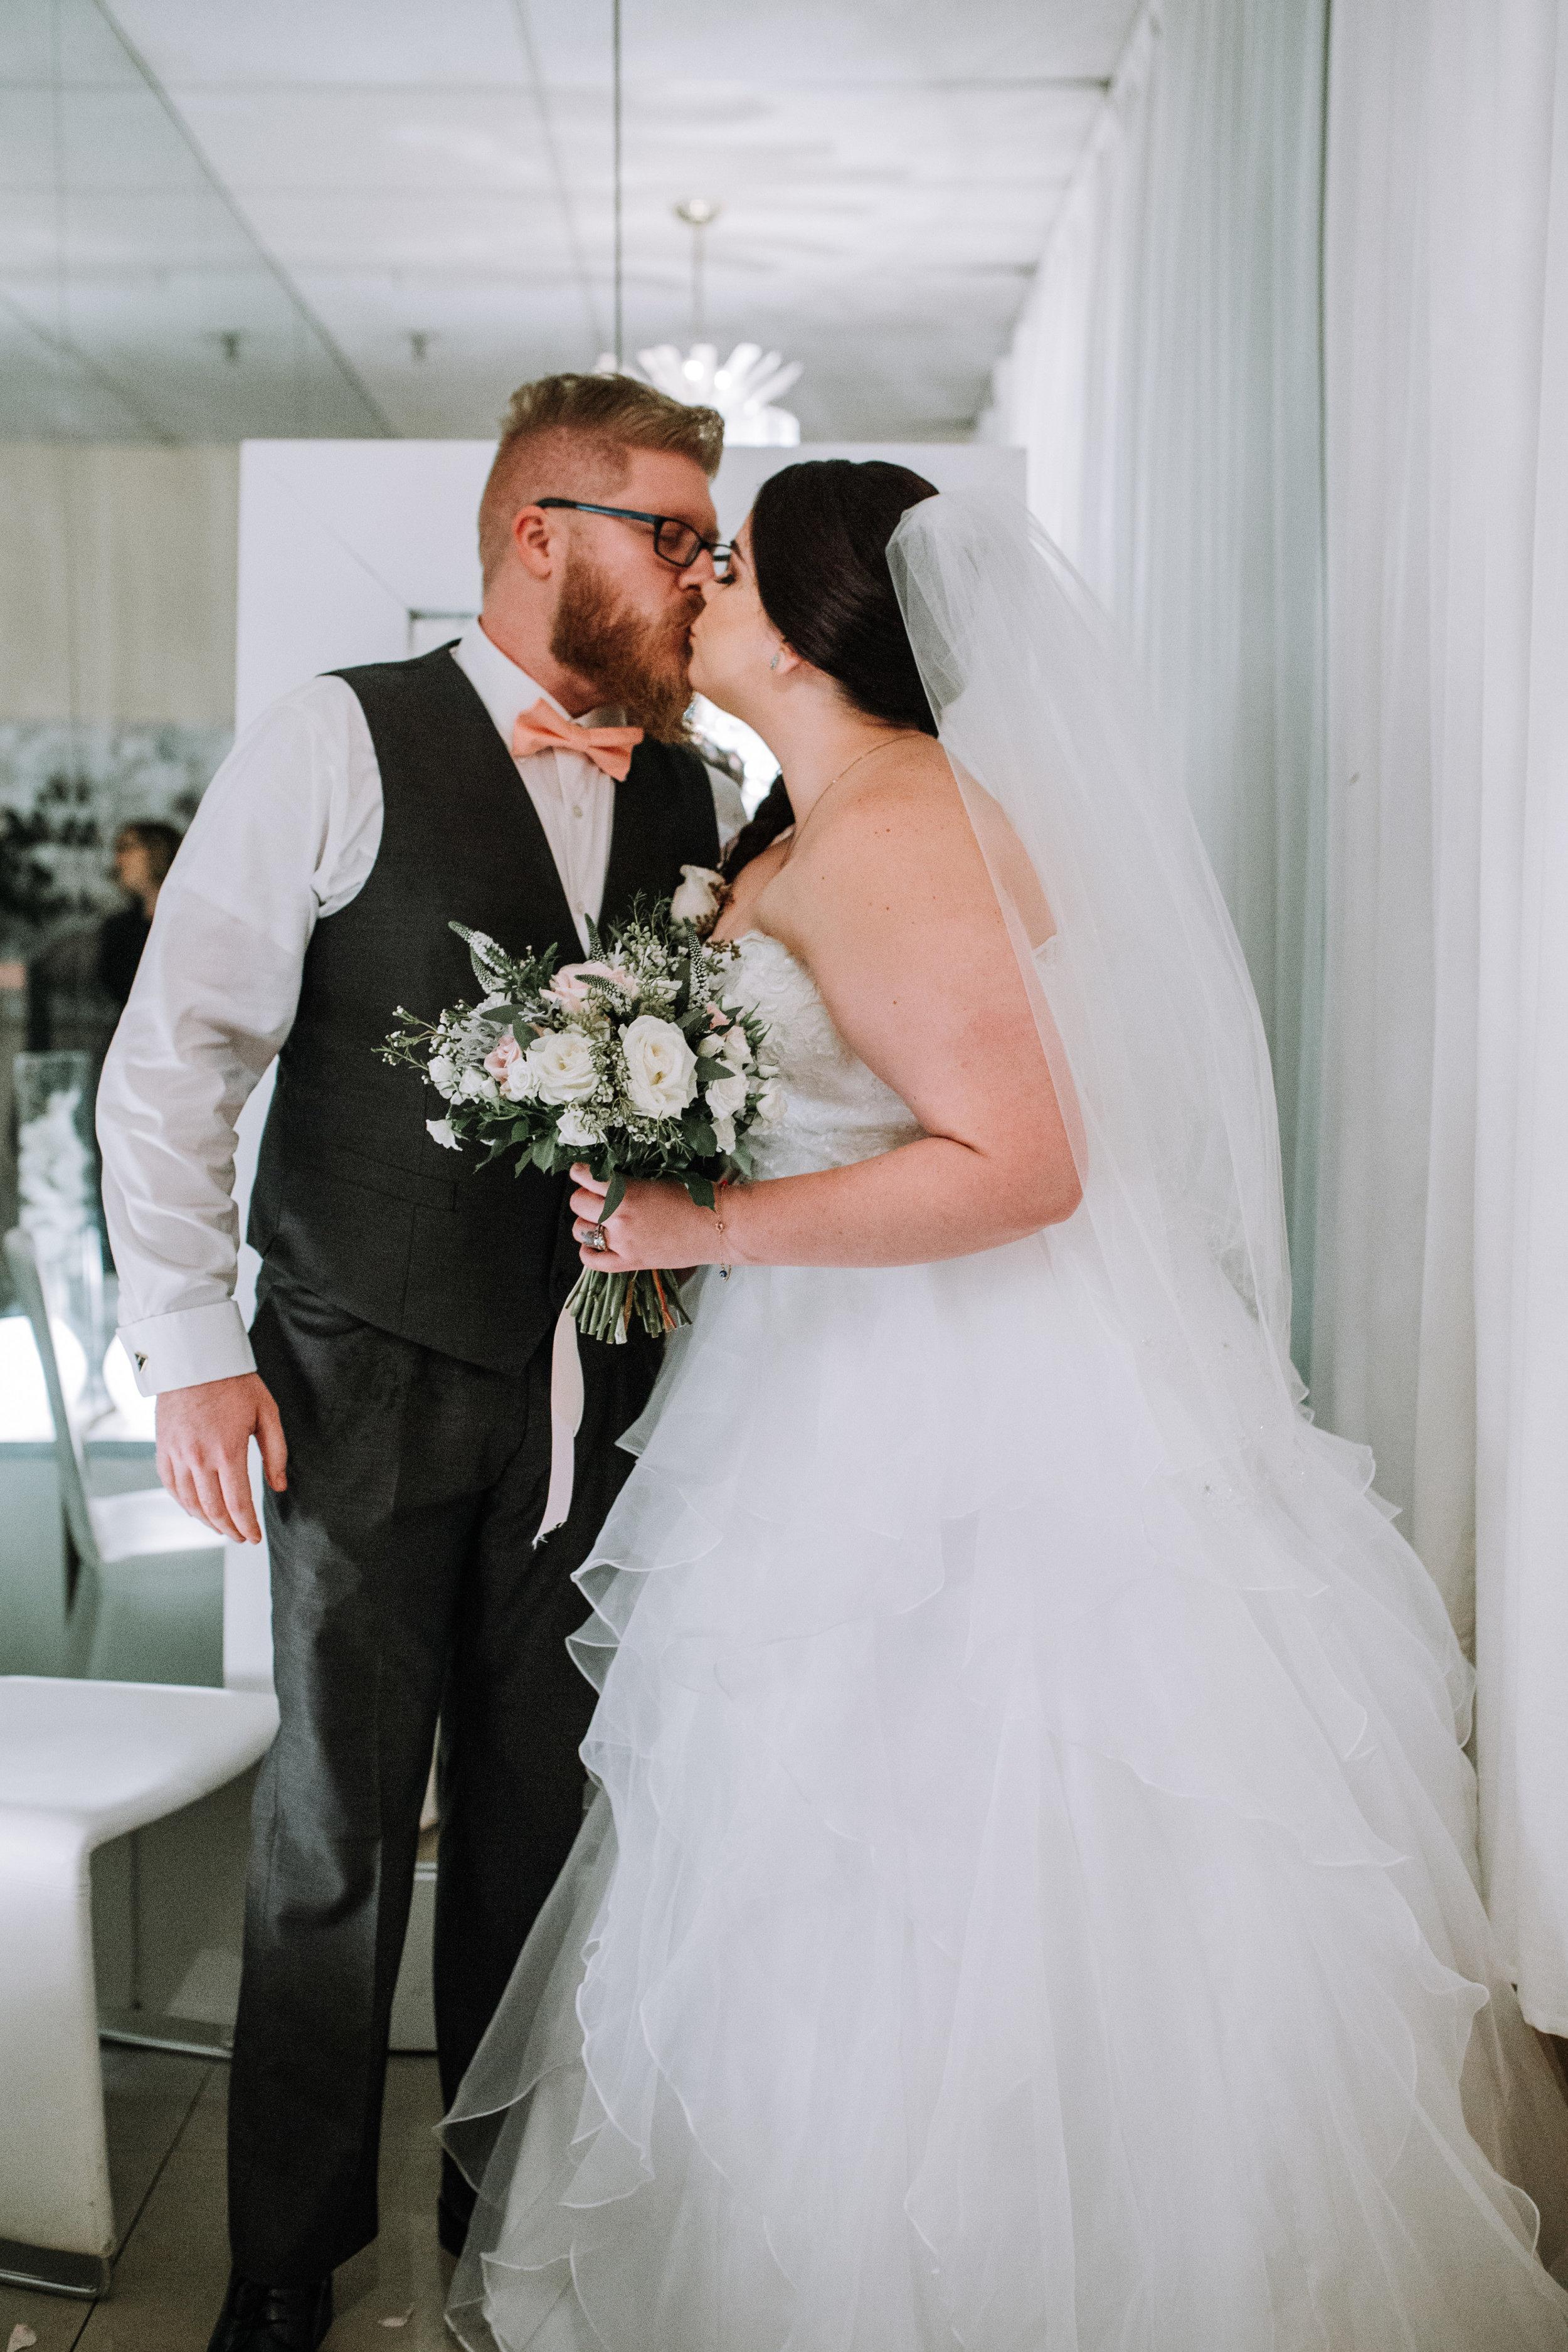 South-Florida-Wedding-photographer-RKMphotography-235.jpg